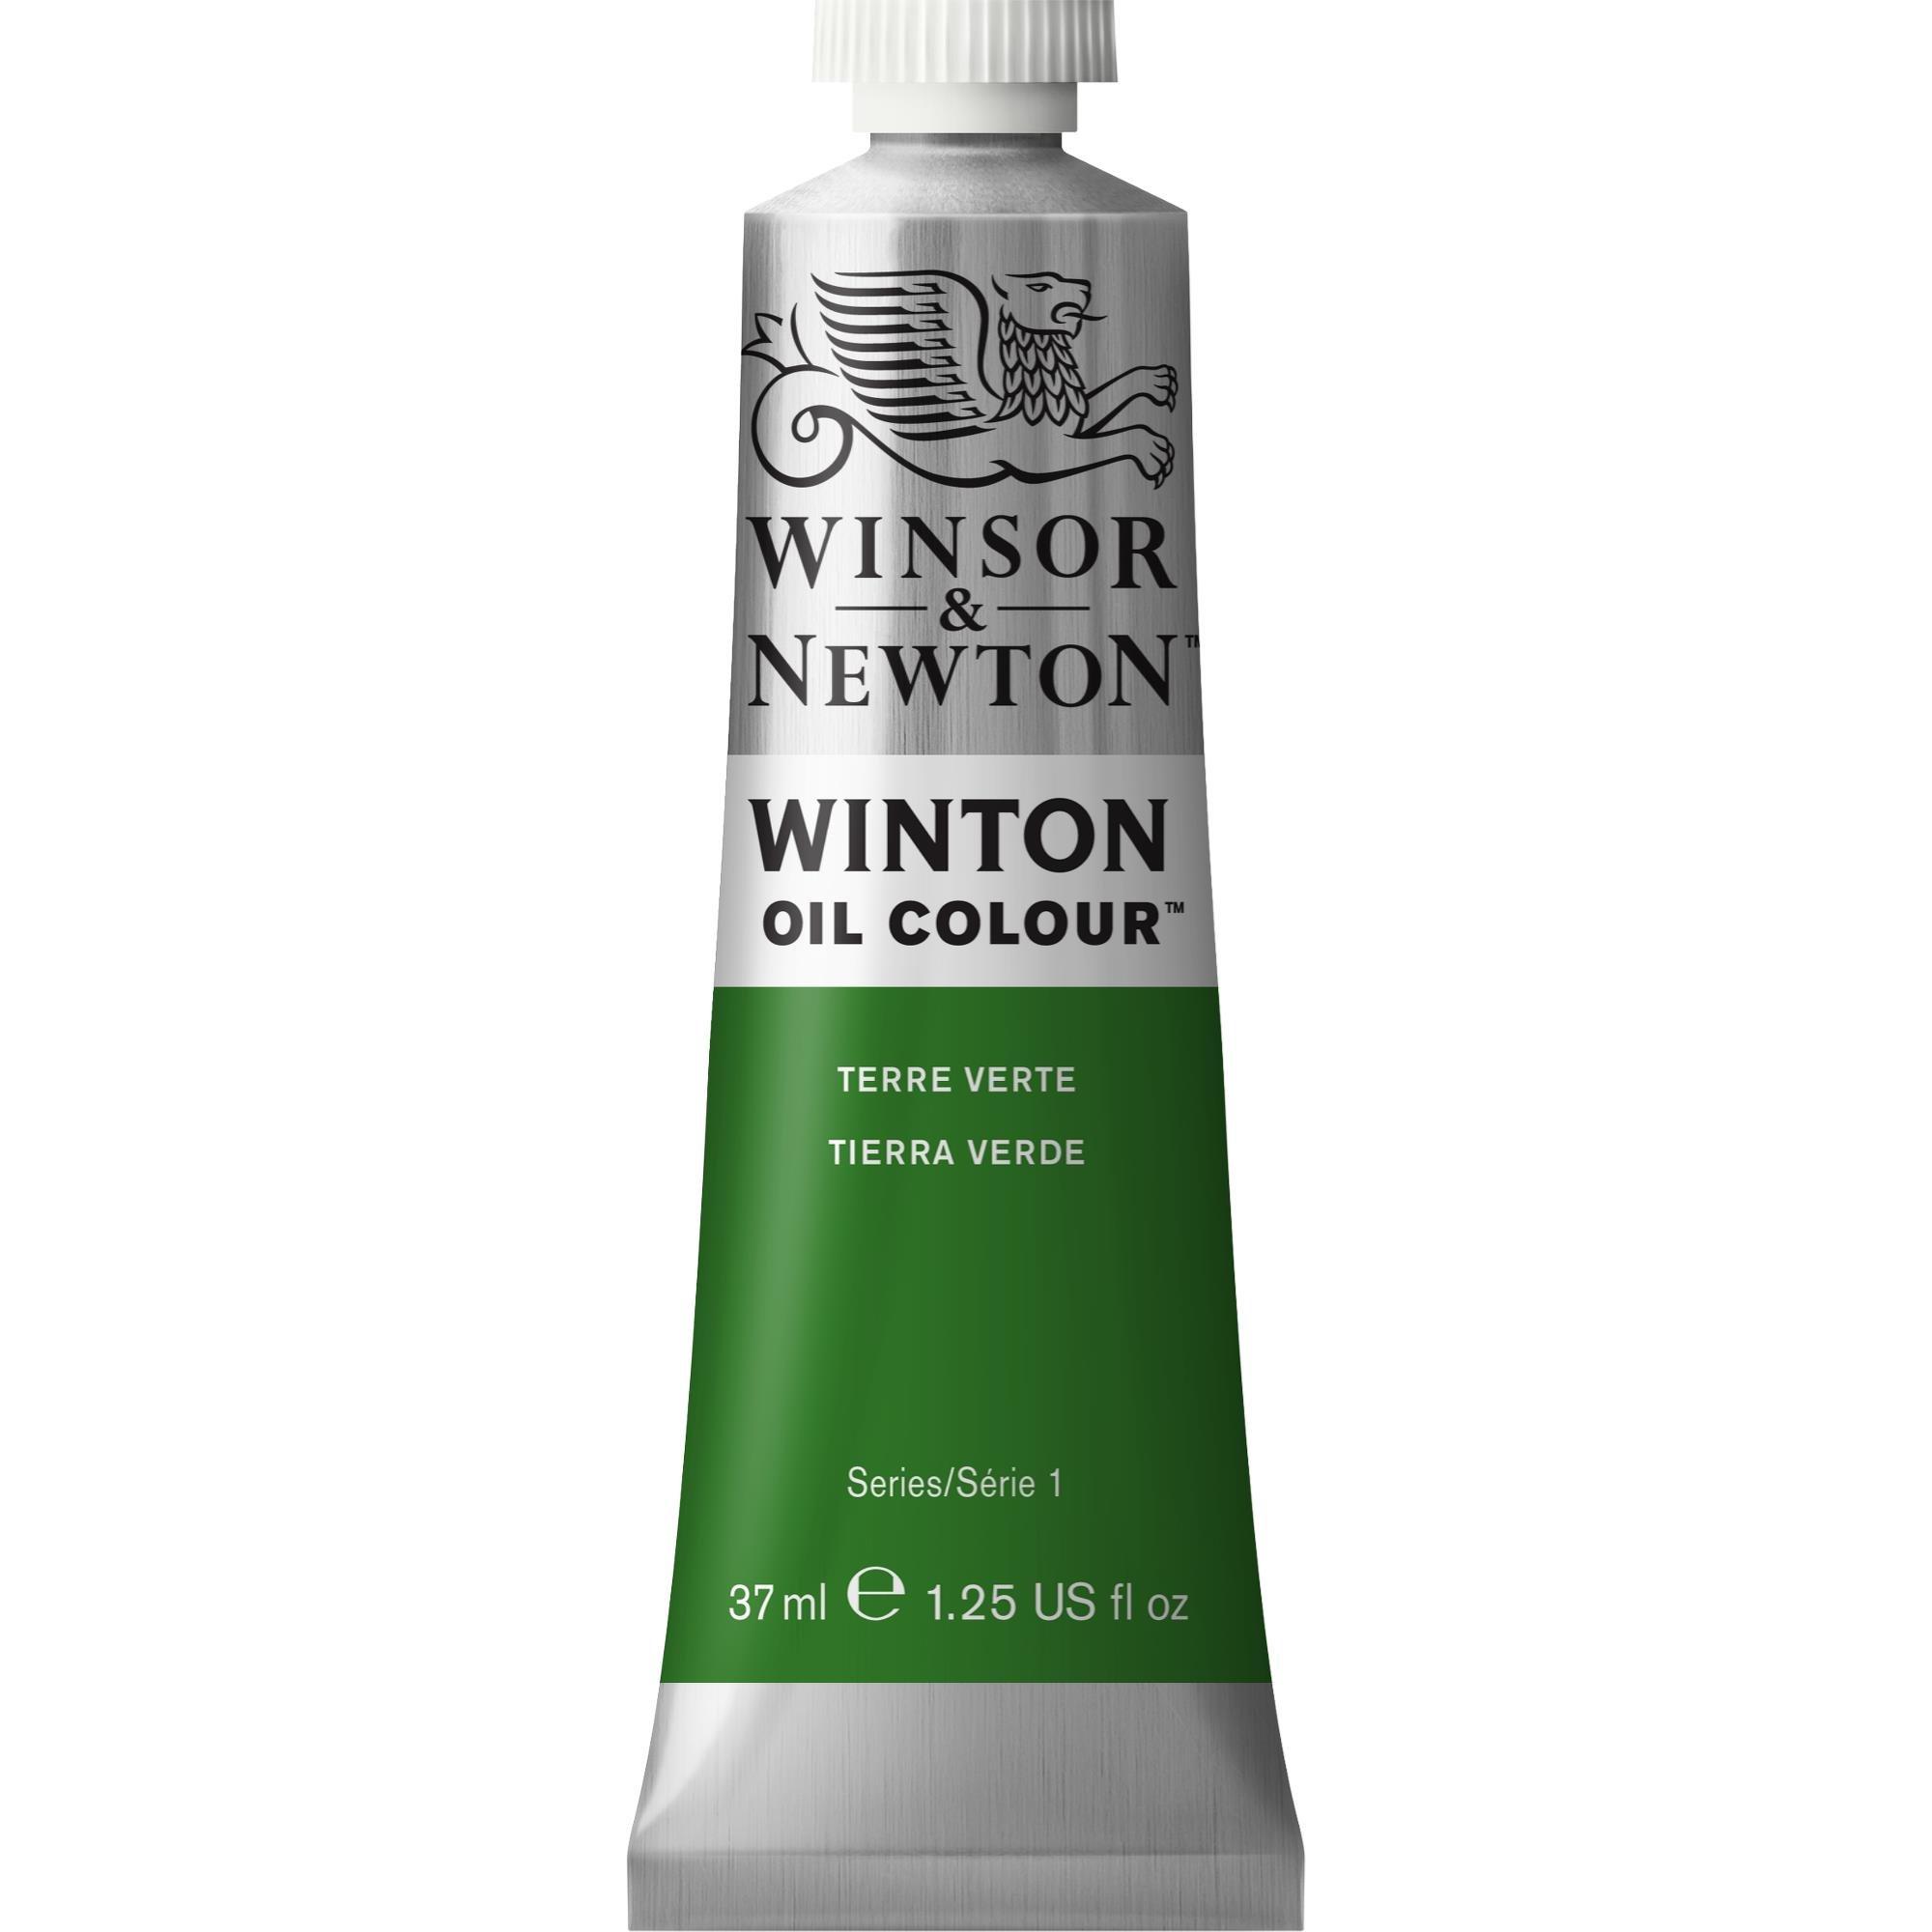 Winsor & Newton Winton Oil Colour Paint, 37ml tube, Terre Verte